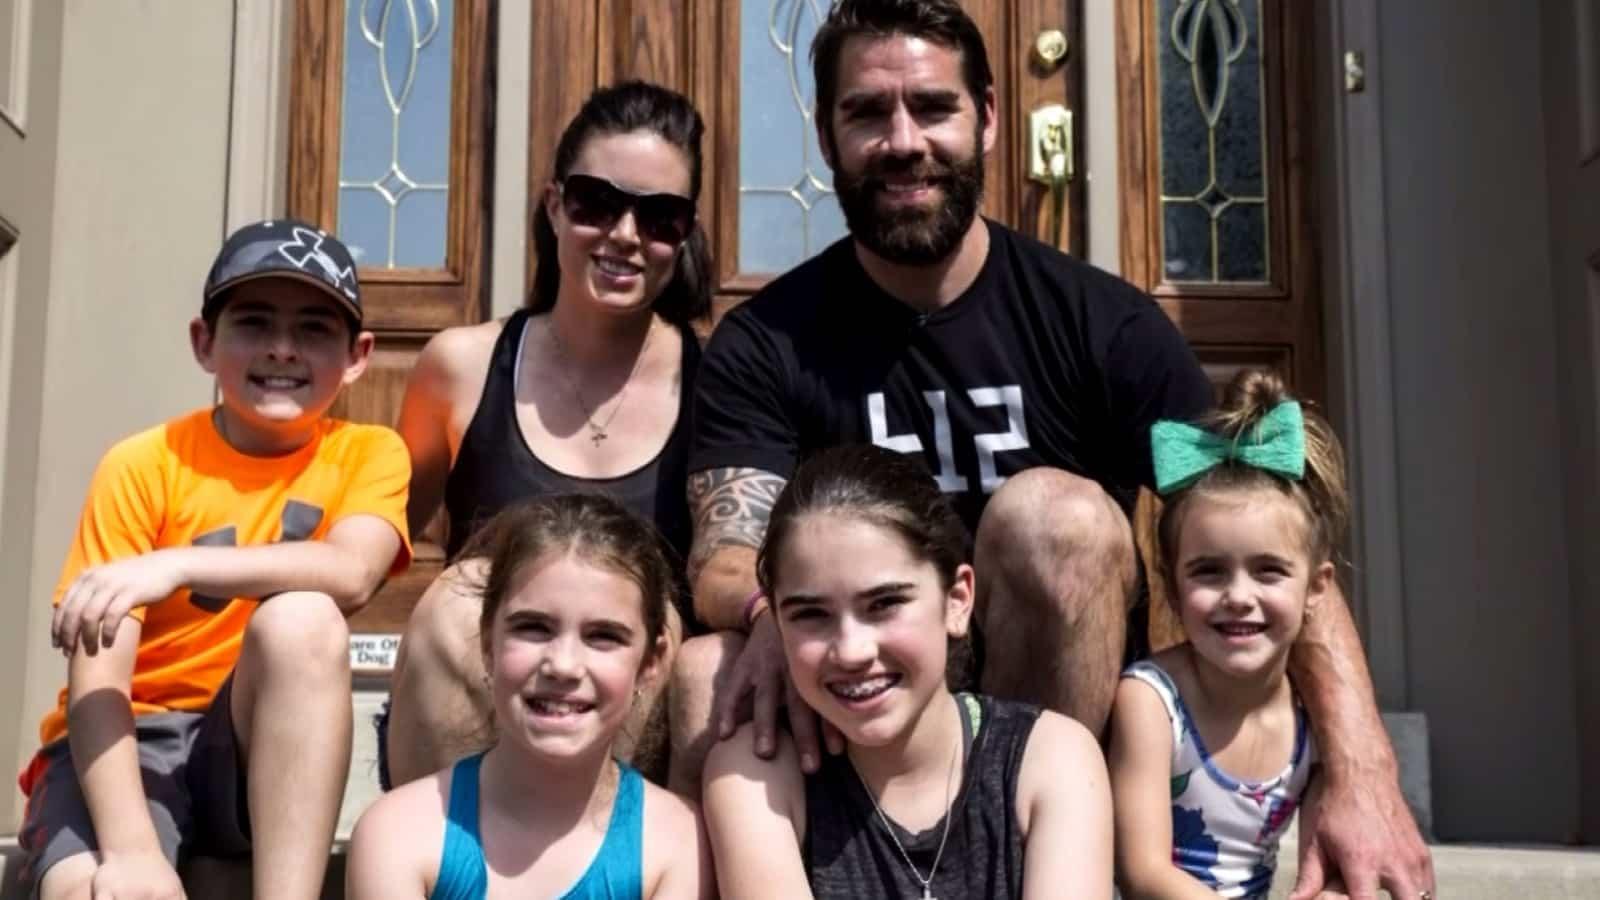 Sports Heureusement a la famille il y TVA rz4wqnrYH